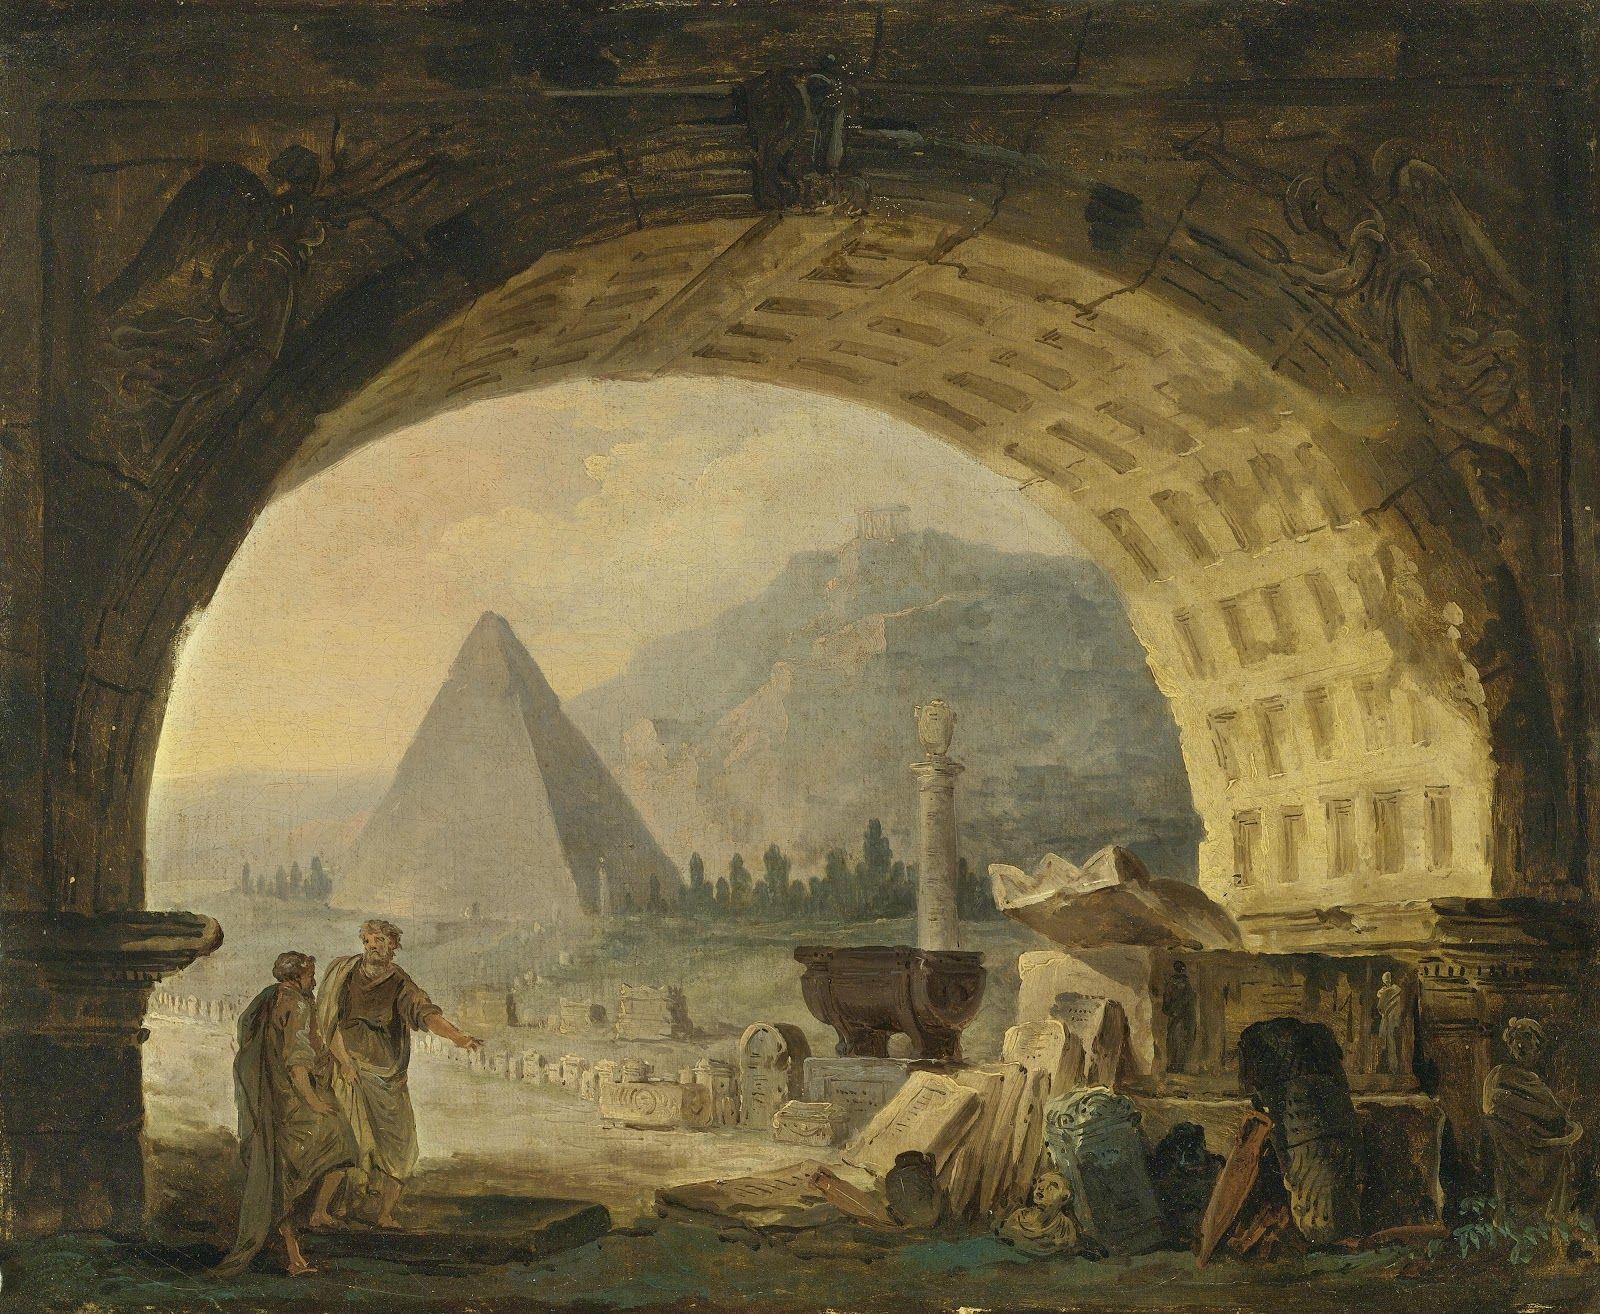 Hubert Robert Visionary Painter In 2021 19th Century Paintings Painter Painting